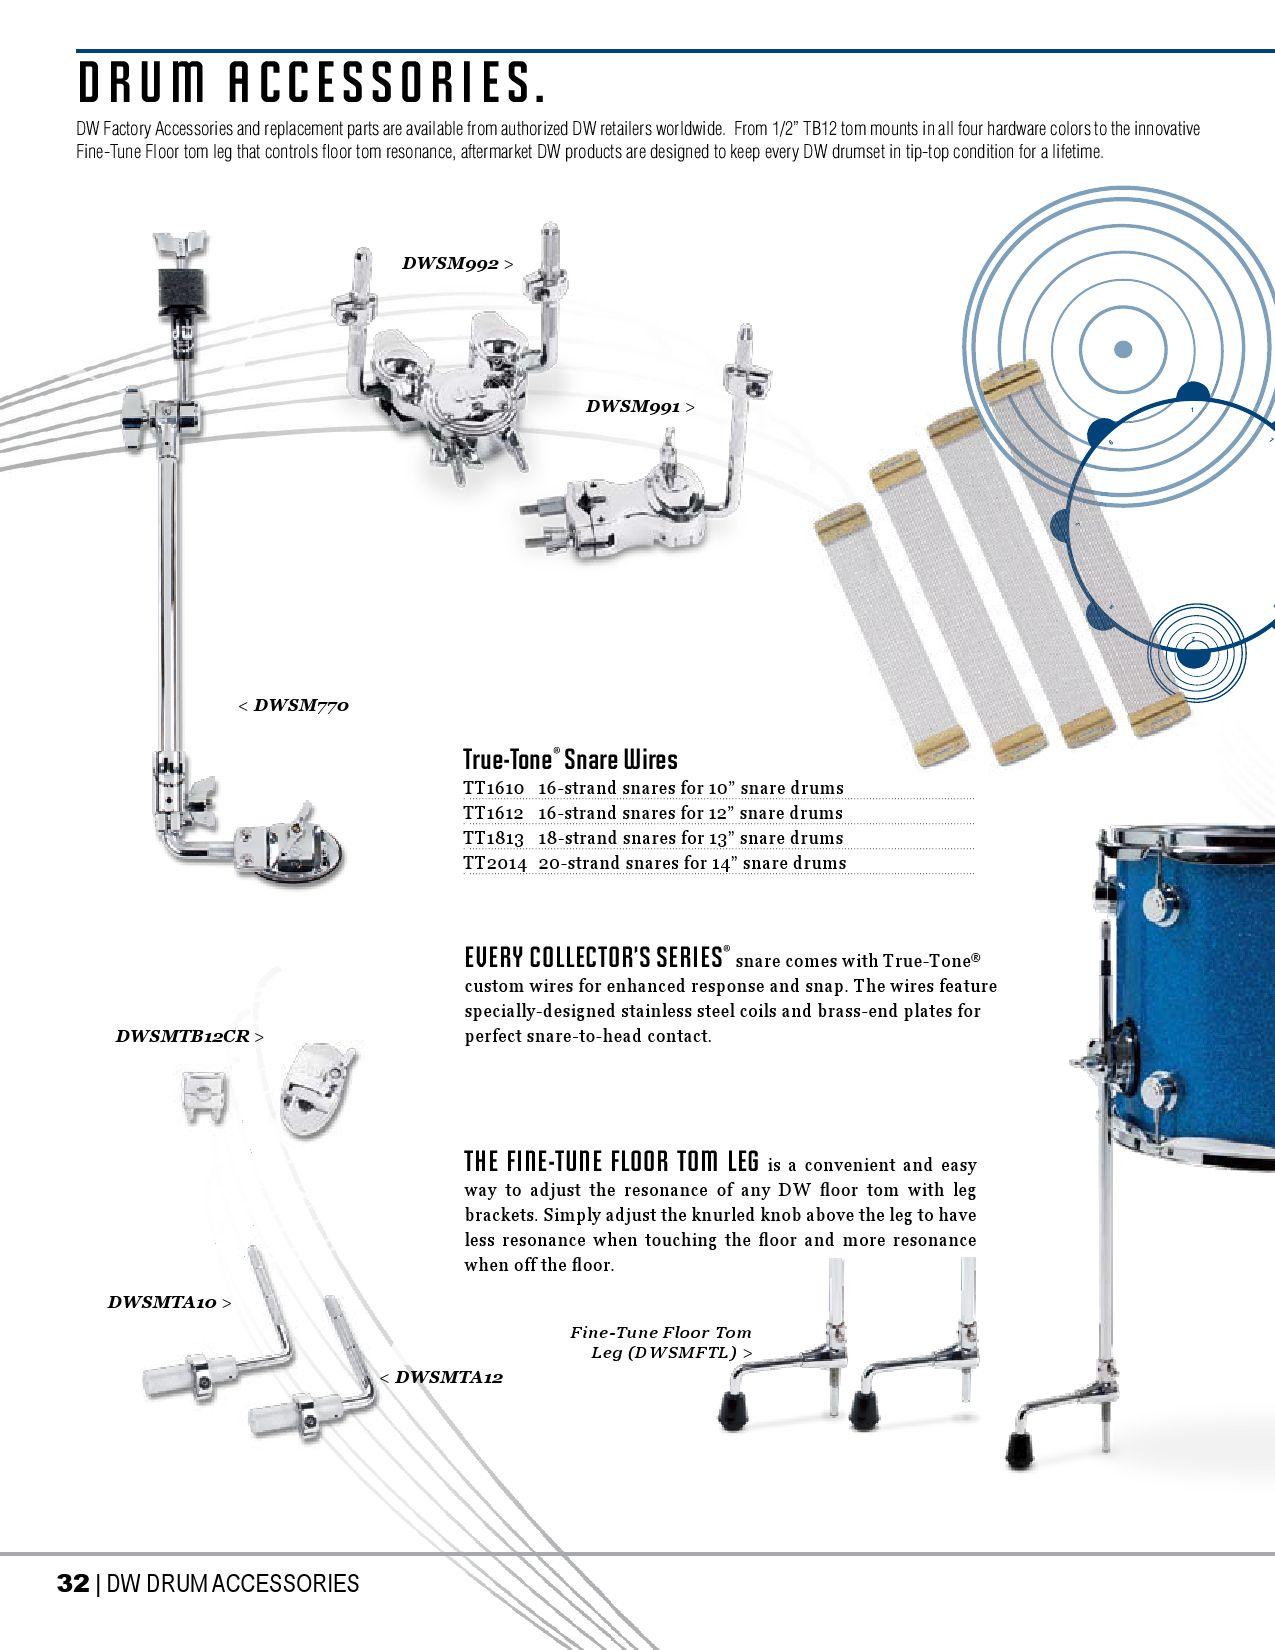 Wondrous Dw Drums Catalogo 2009 By Pride Music Issuu Wiring 101 Mecadwellnesstrialsorg